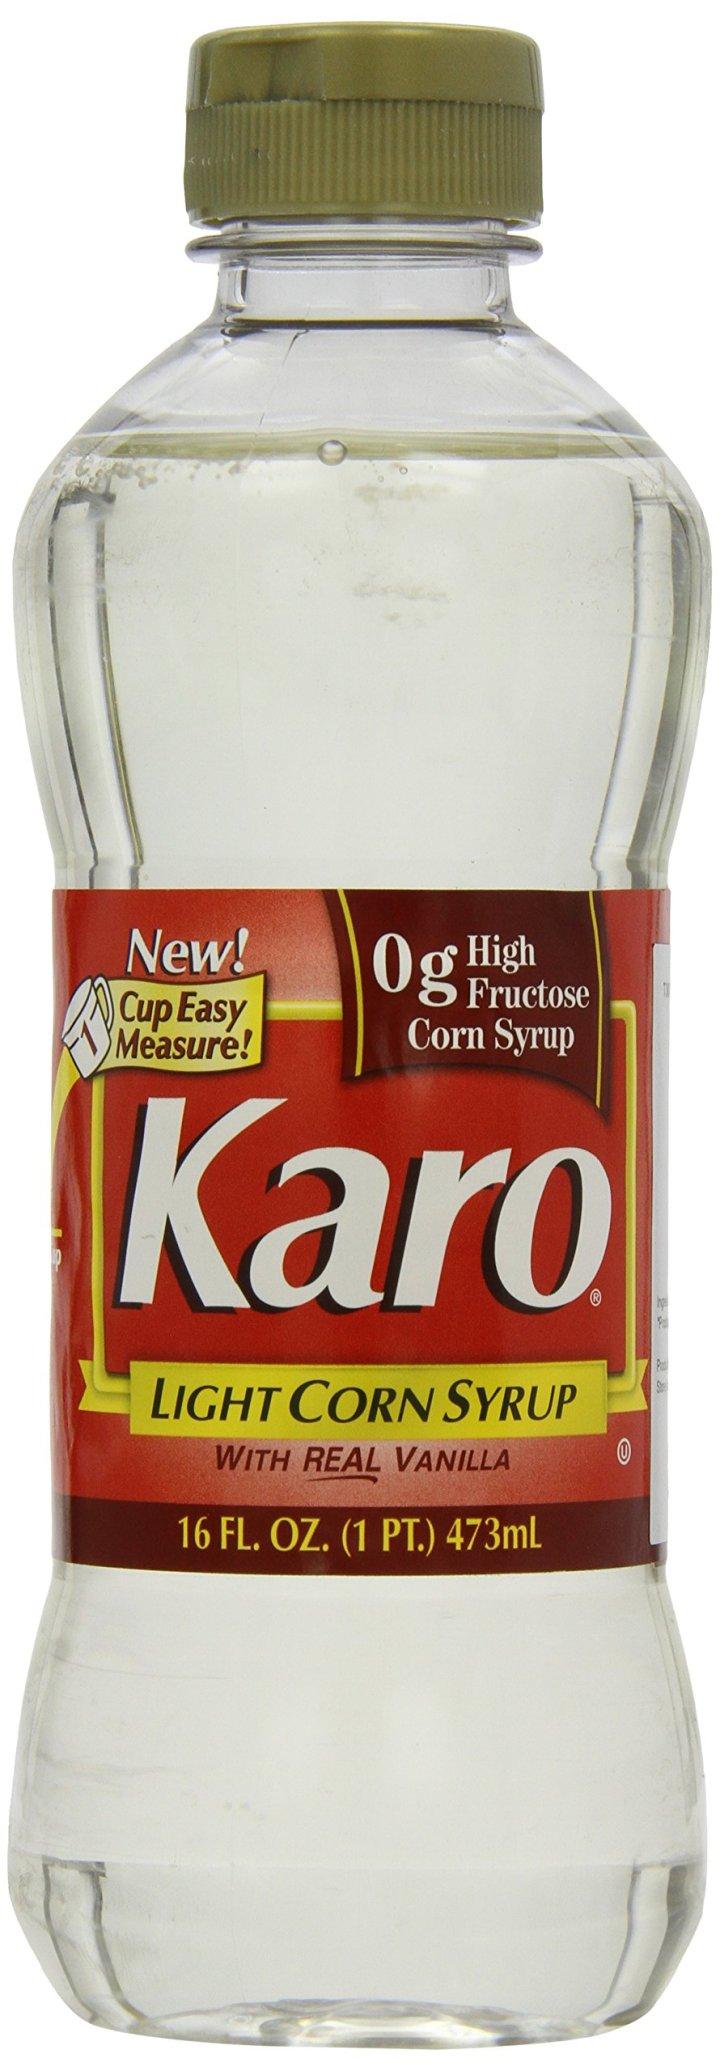 Do You Use Light Or Dark Karo Syrup For Infant